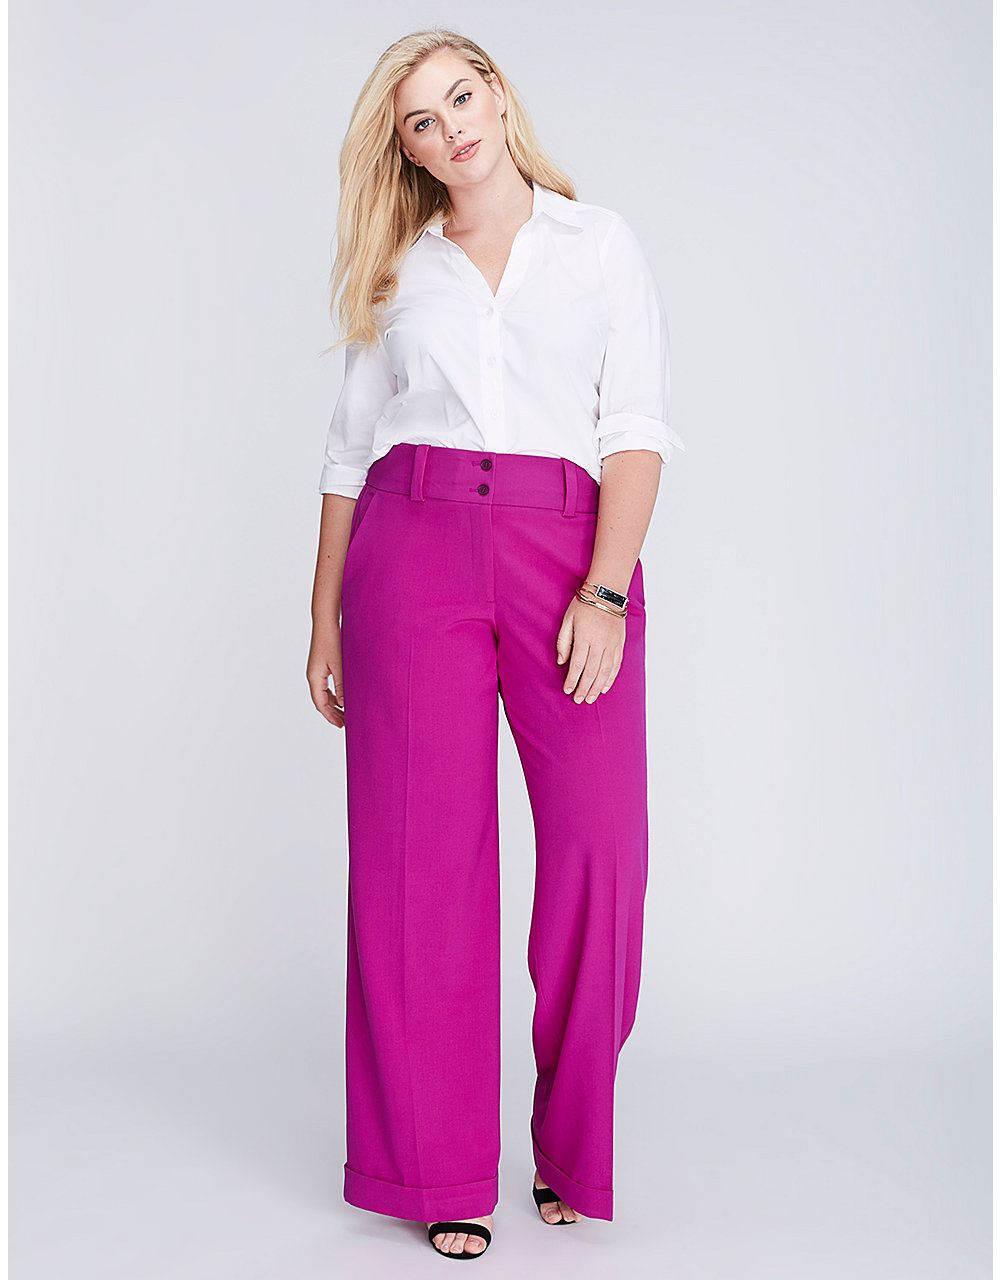 1a012605cc455 Lena Tailored Stretch Wide Leg Pant